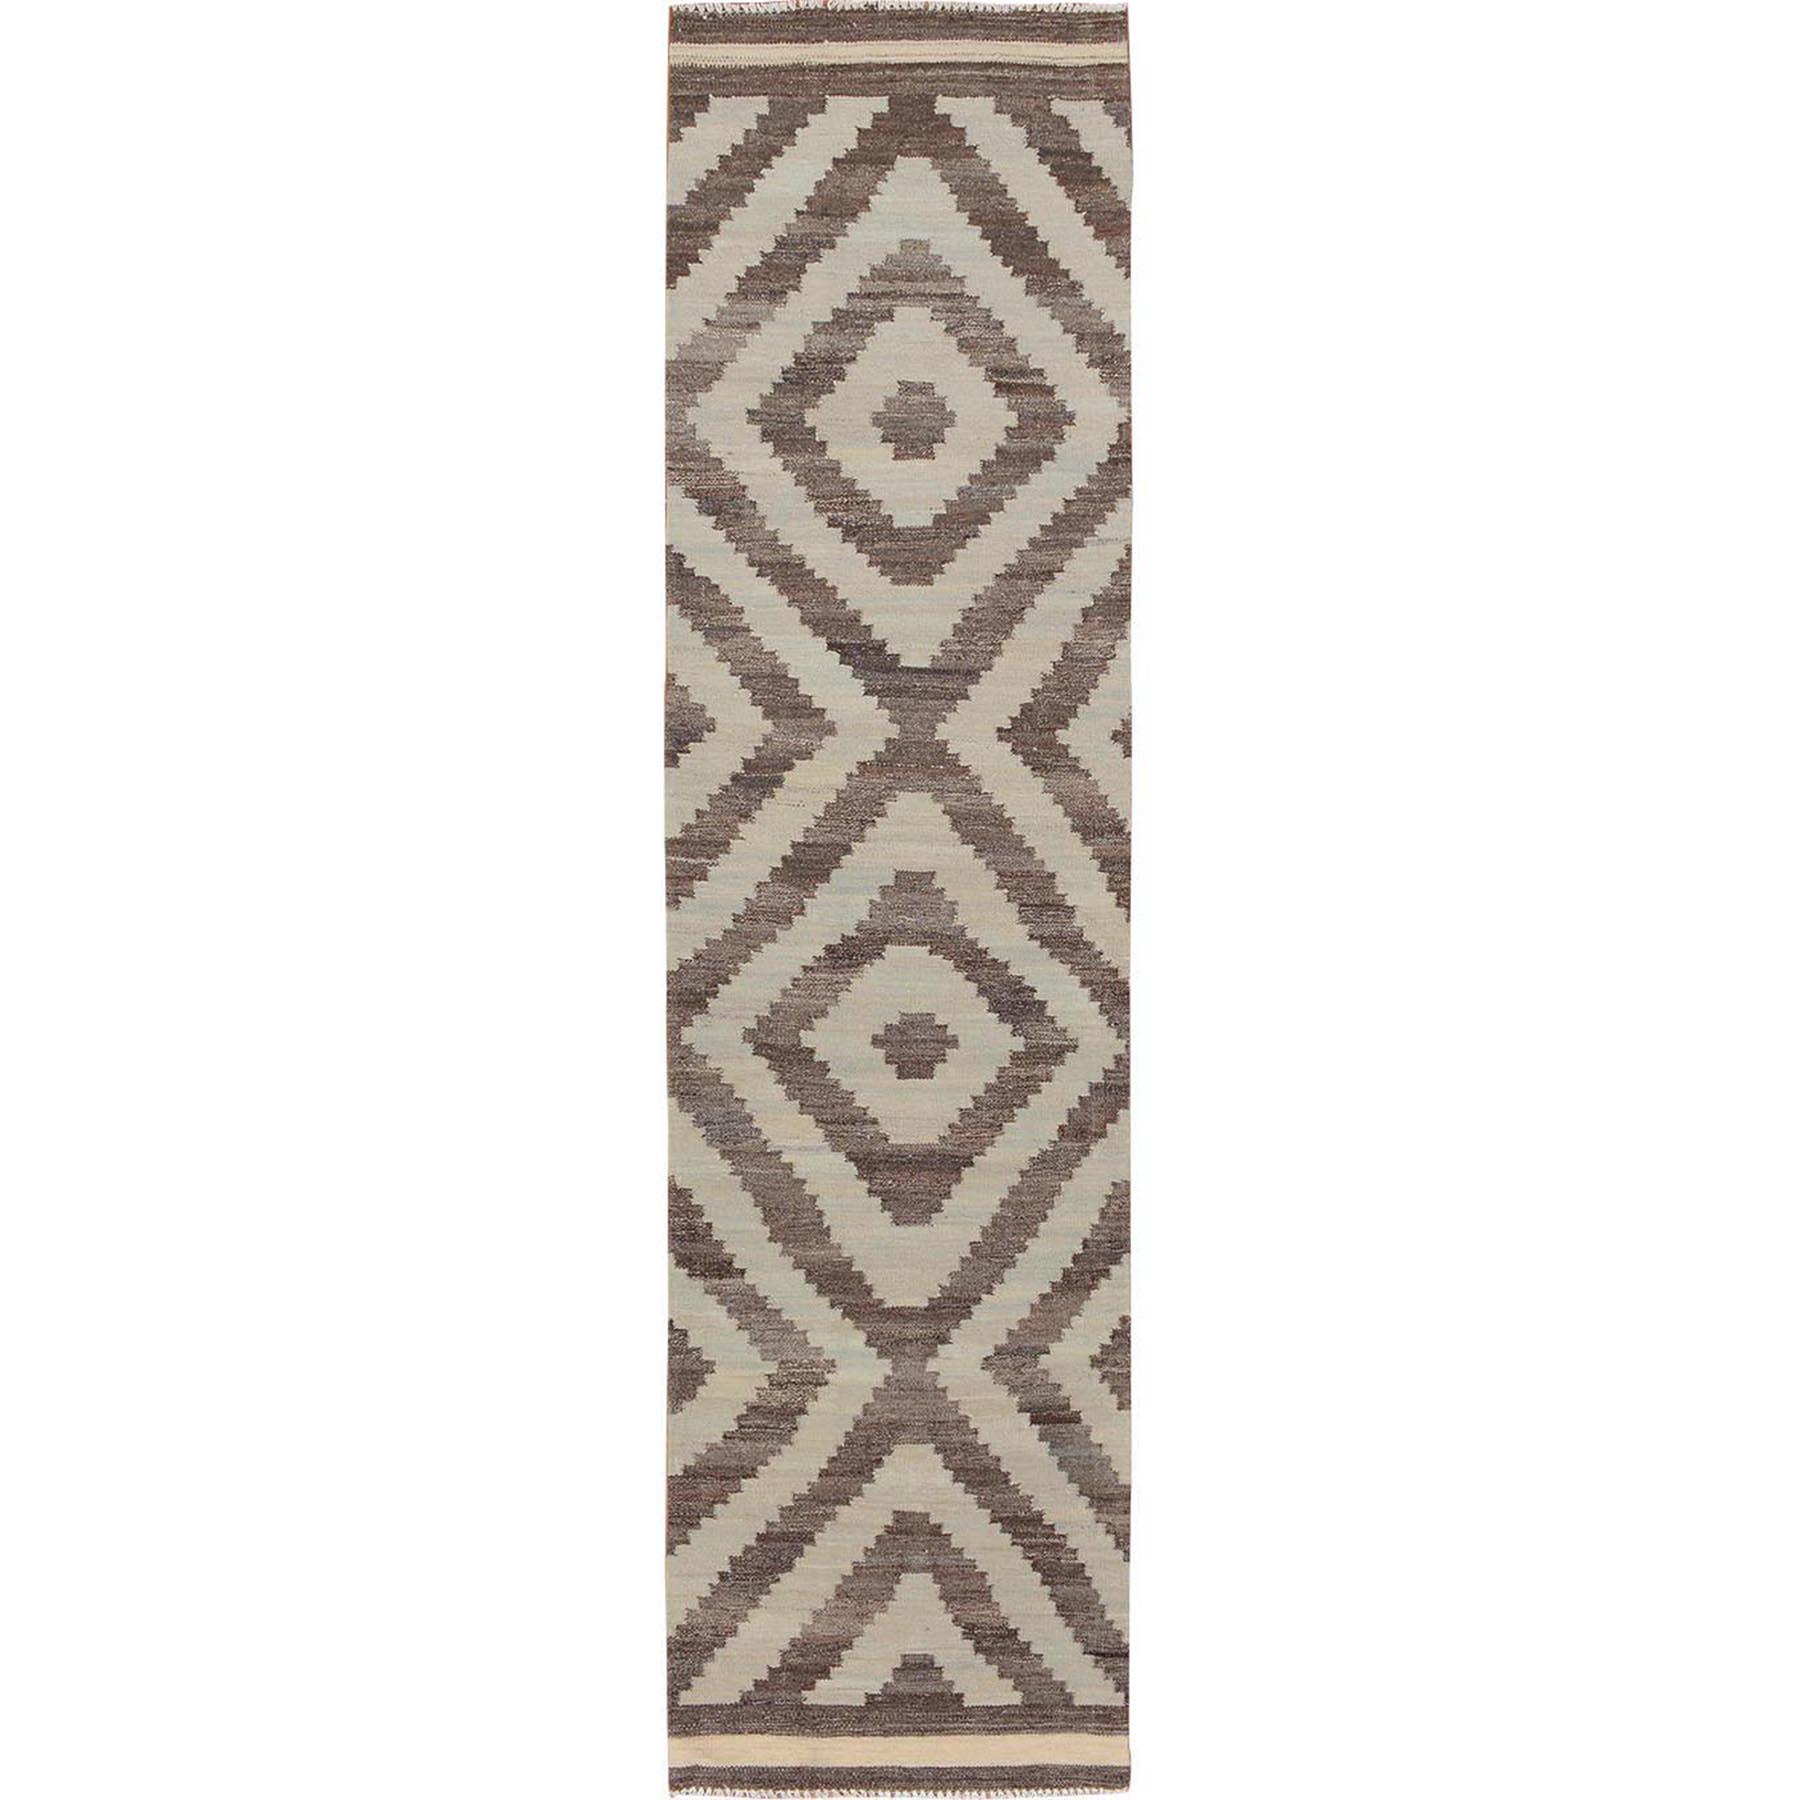 "2'3""x9'4"" Ivory Reversible Afghan Kilim Tribal Design Runner Pure Wool Hand Woven Oriental Rug"